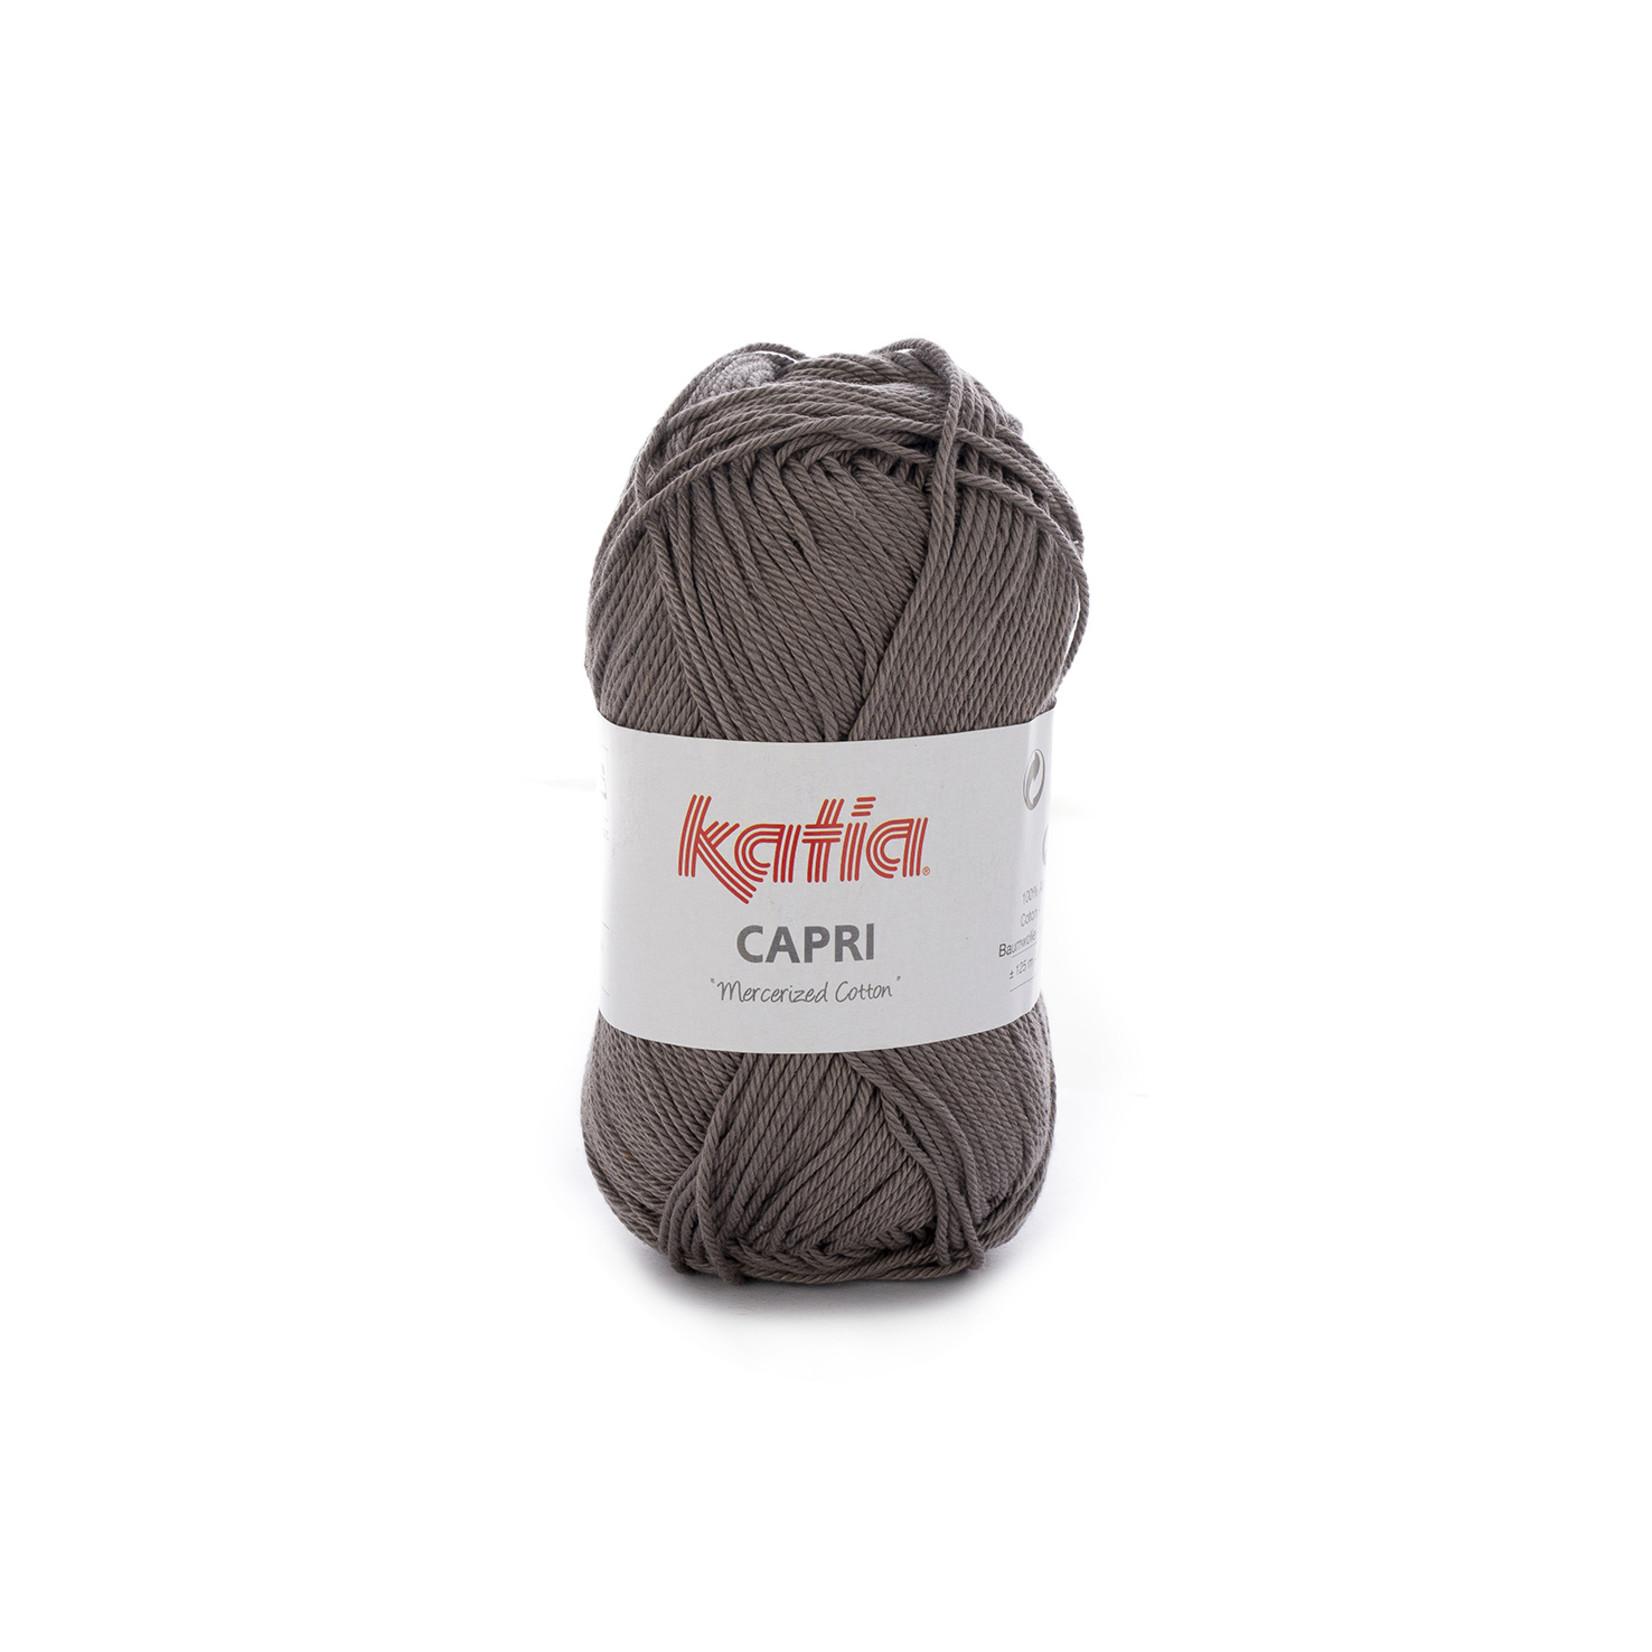 Katia Katia Capri - kleur 163 Reebruin - 50 gr. = 125 m. - 100% katoen